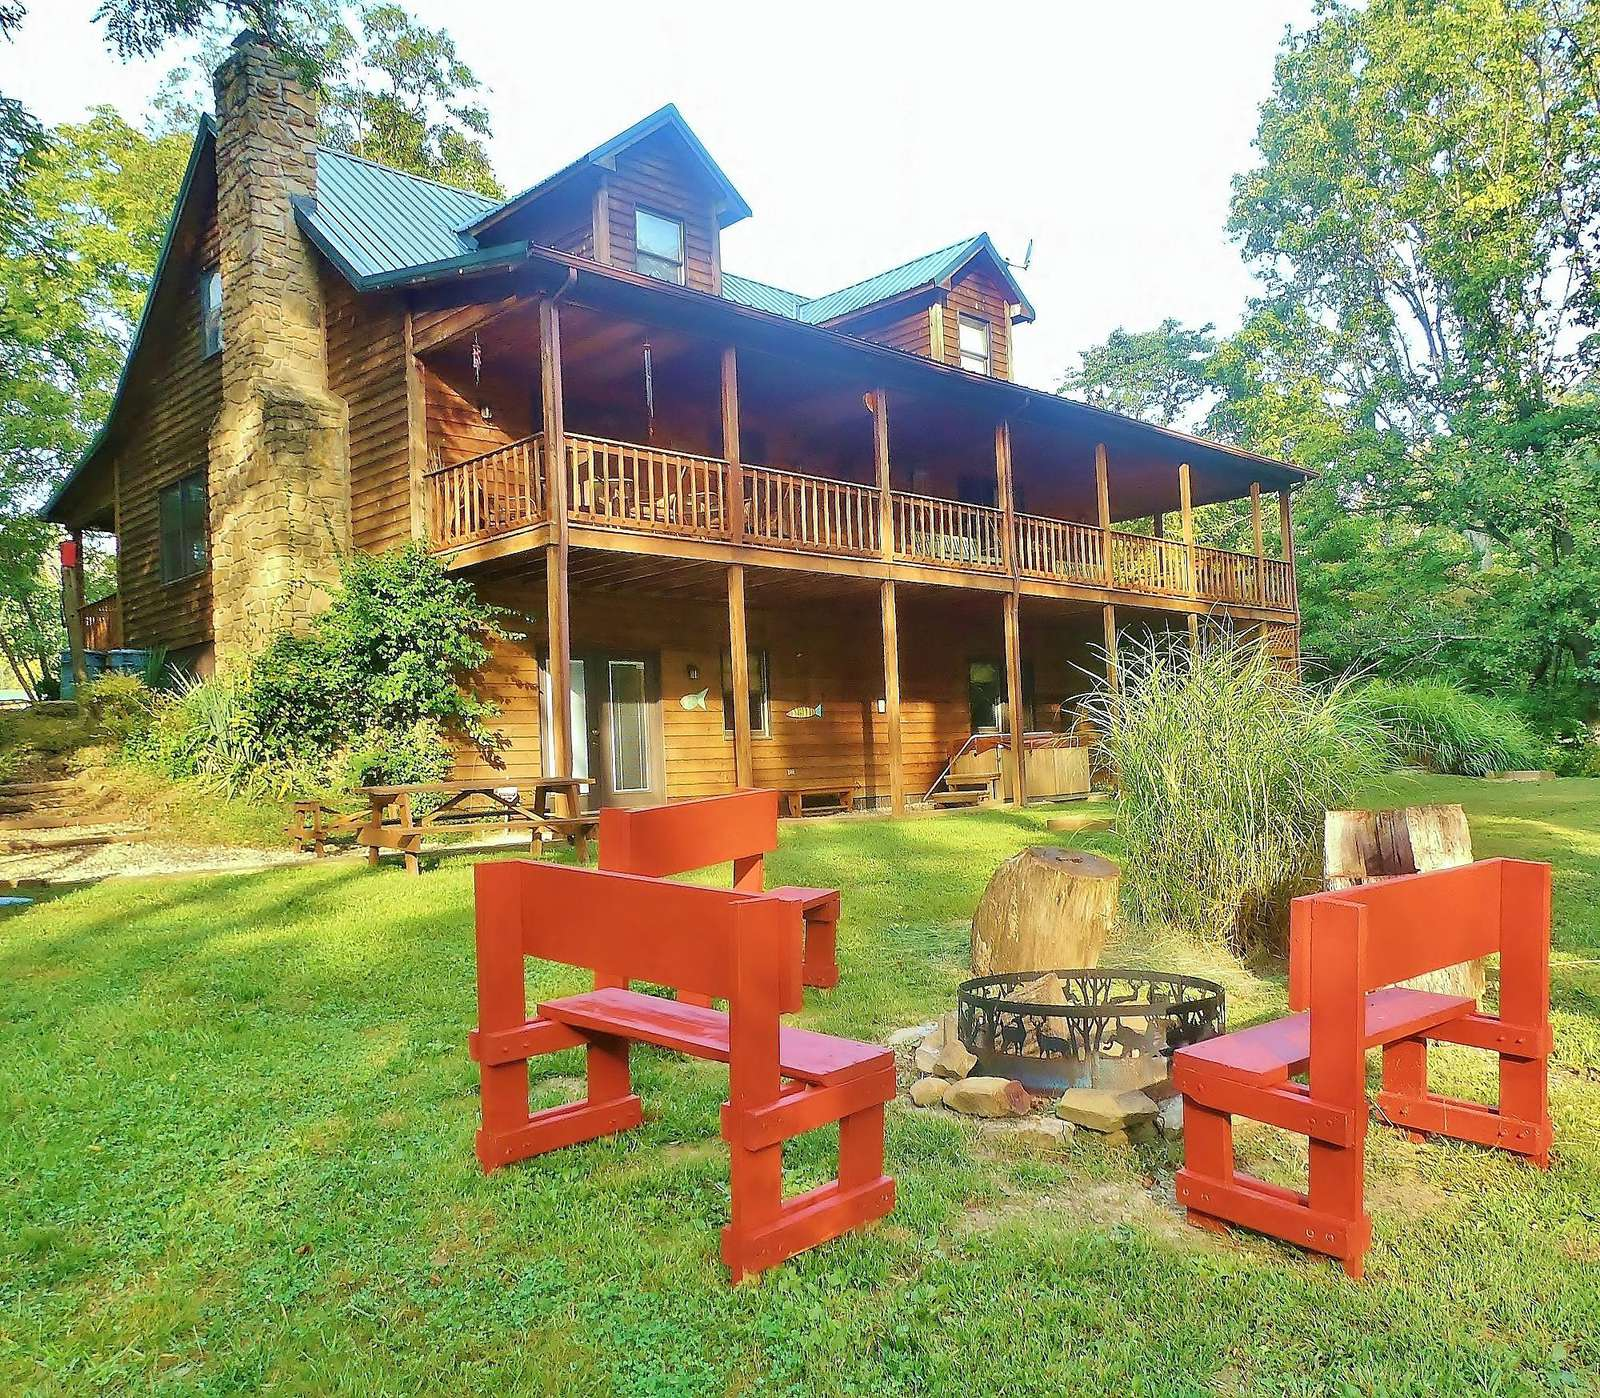 Enchanted Lake Lodge - property